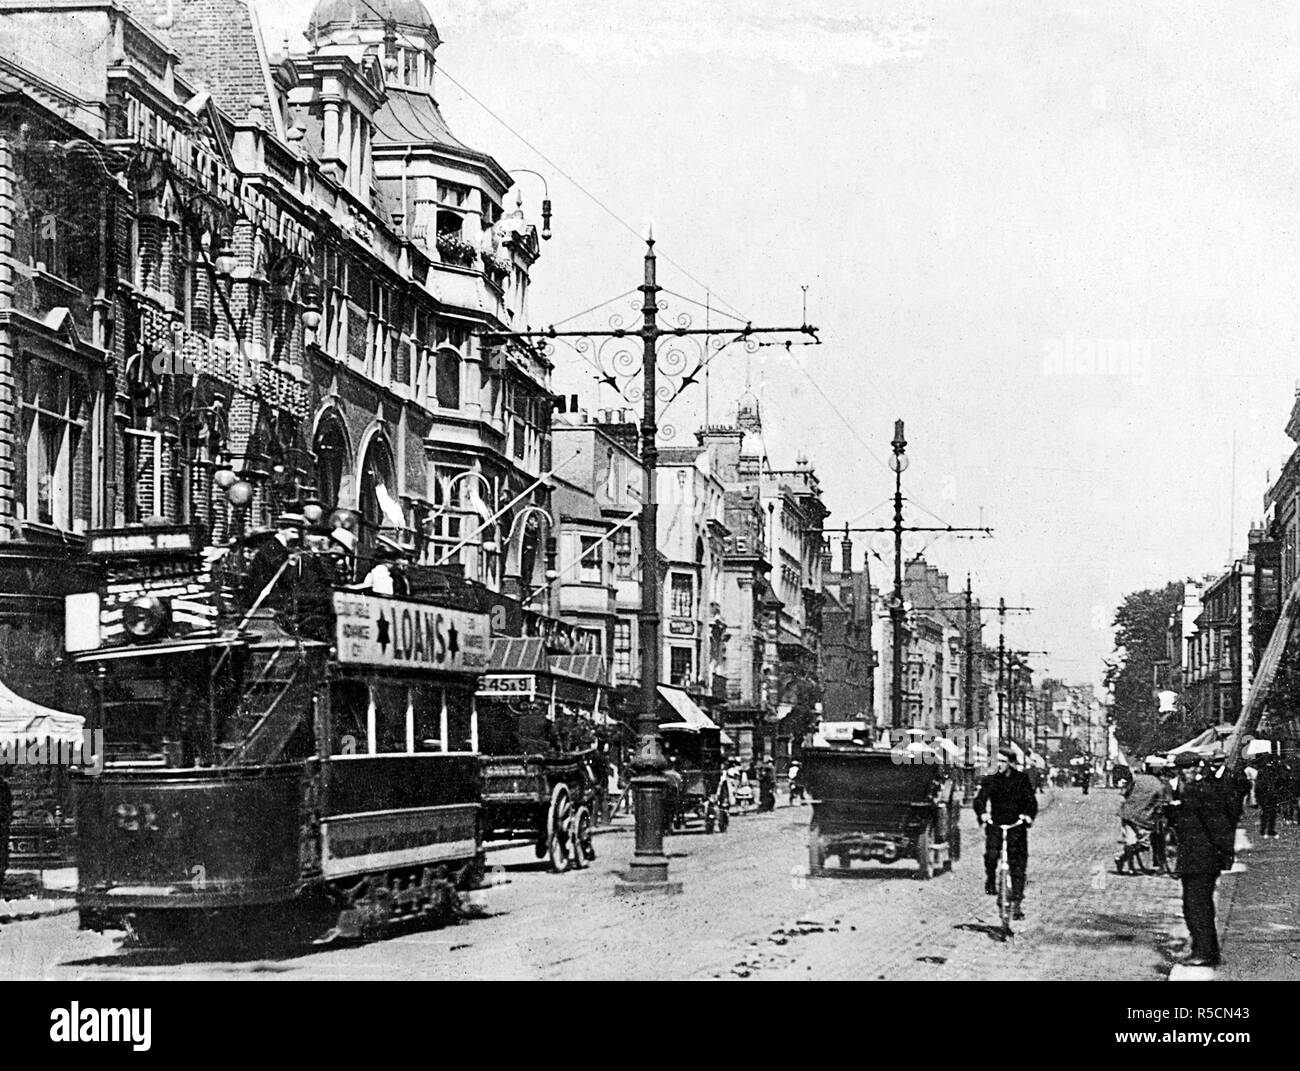 Southampton - Stock Image